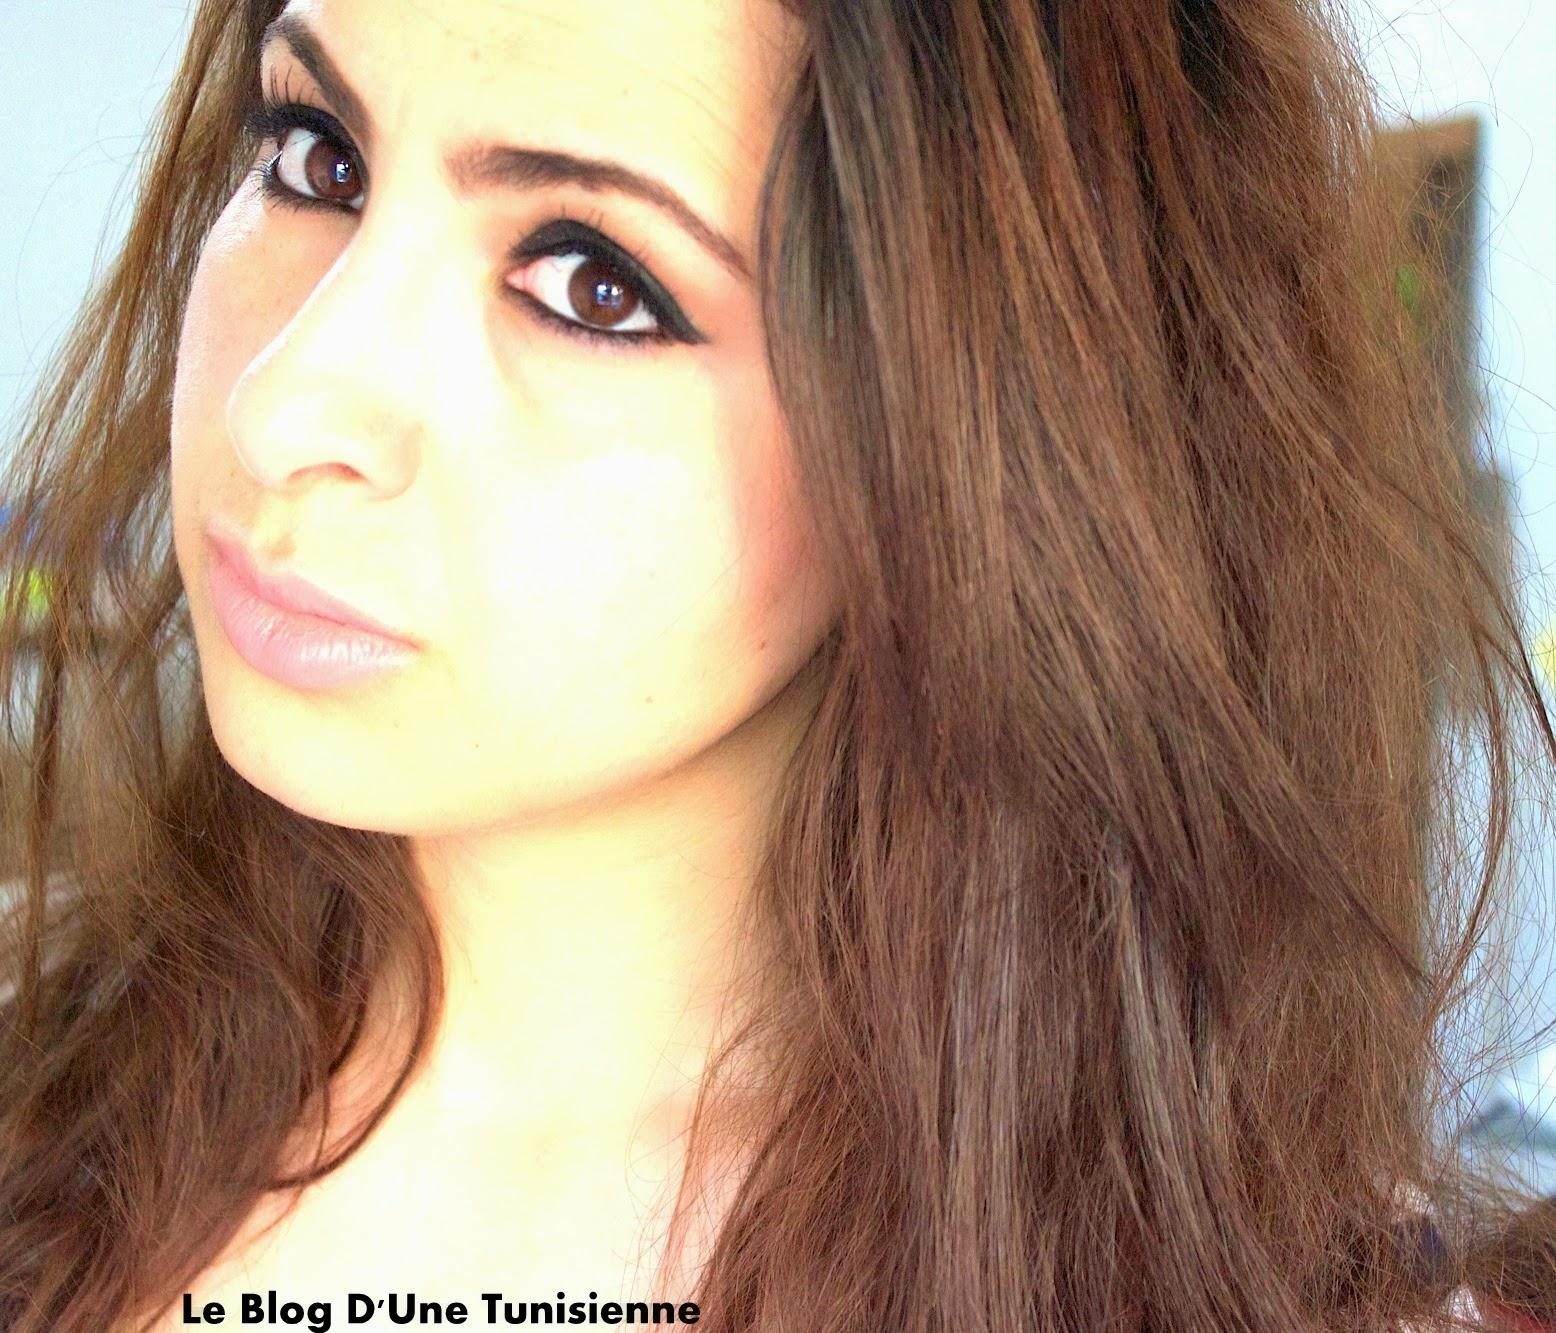 Tuto black smoky eye le blog d 39 une tunisienne - Smoky eyes tuto ...